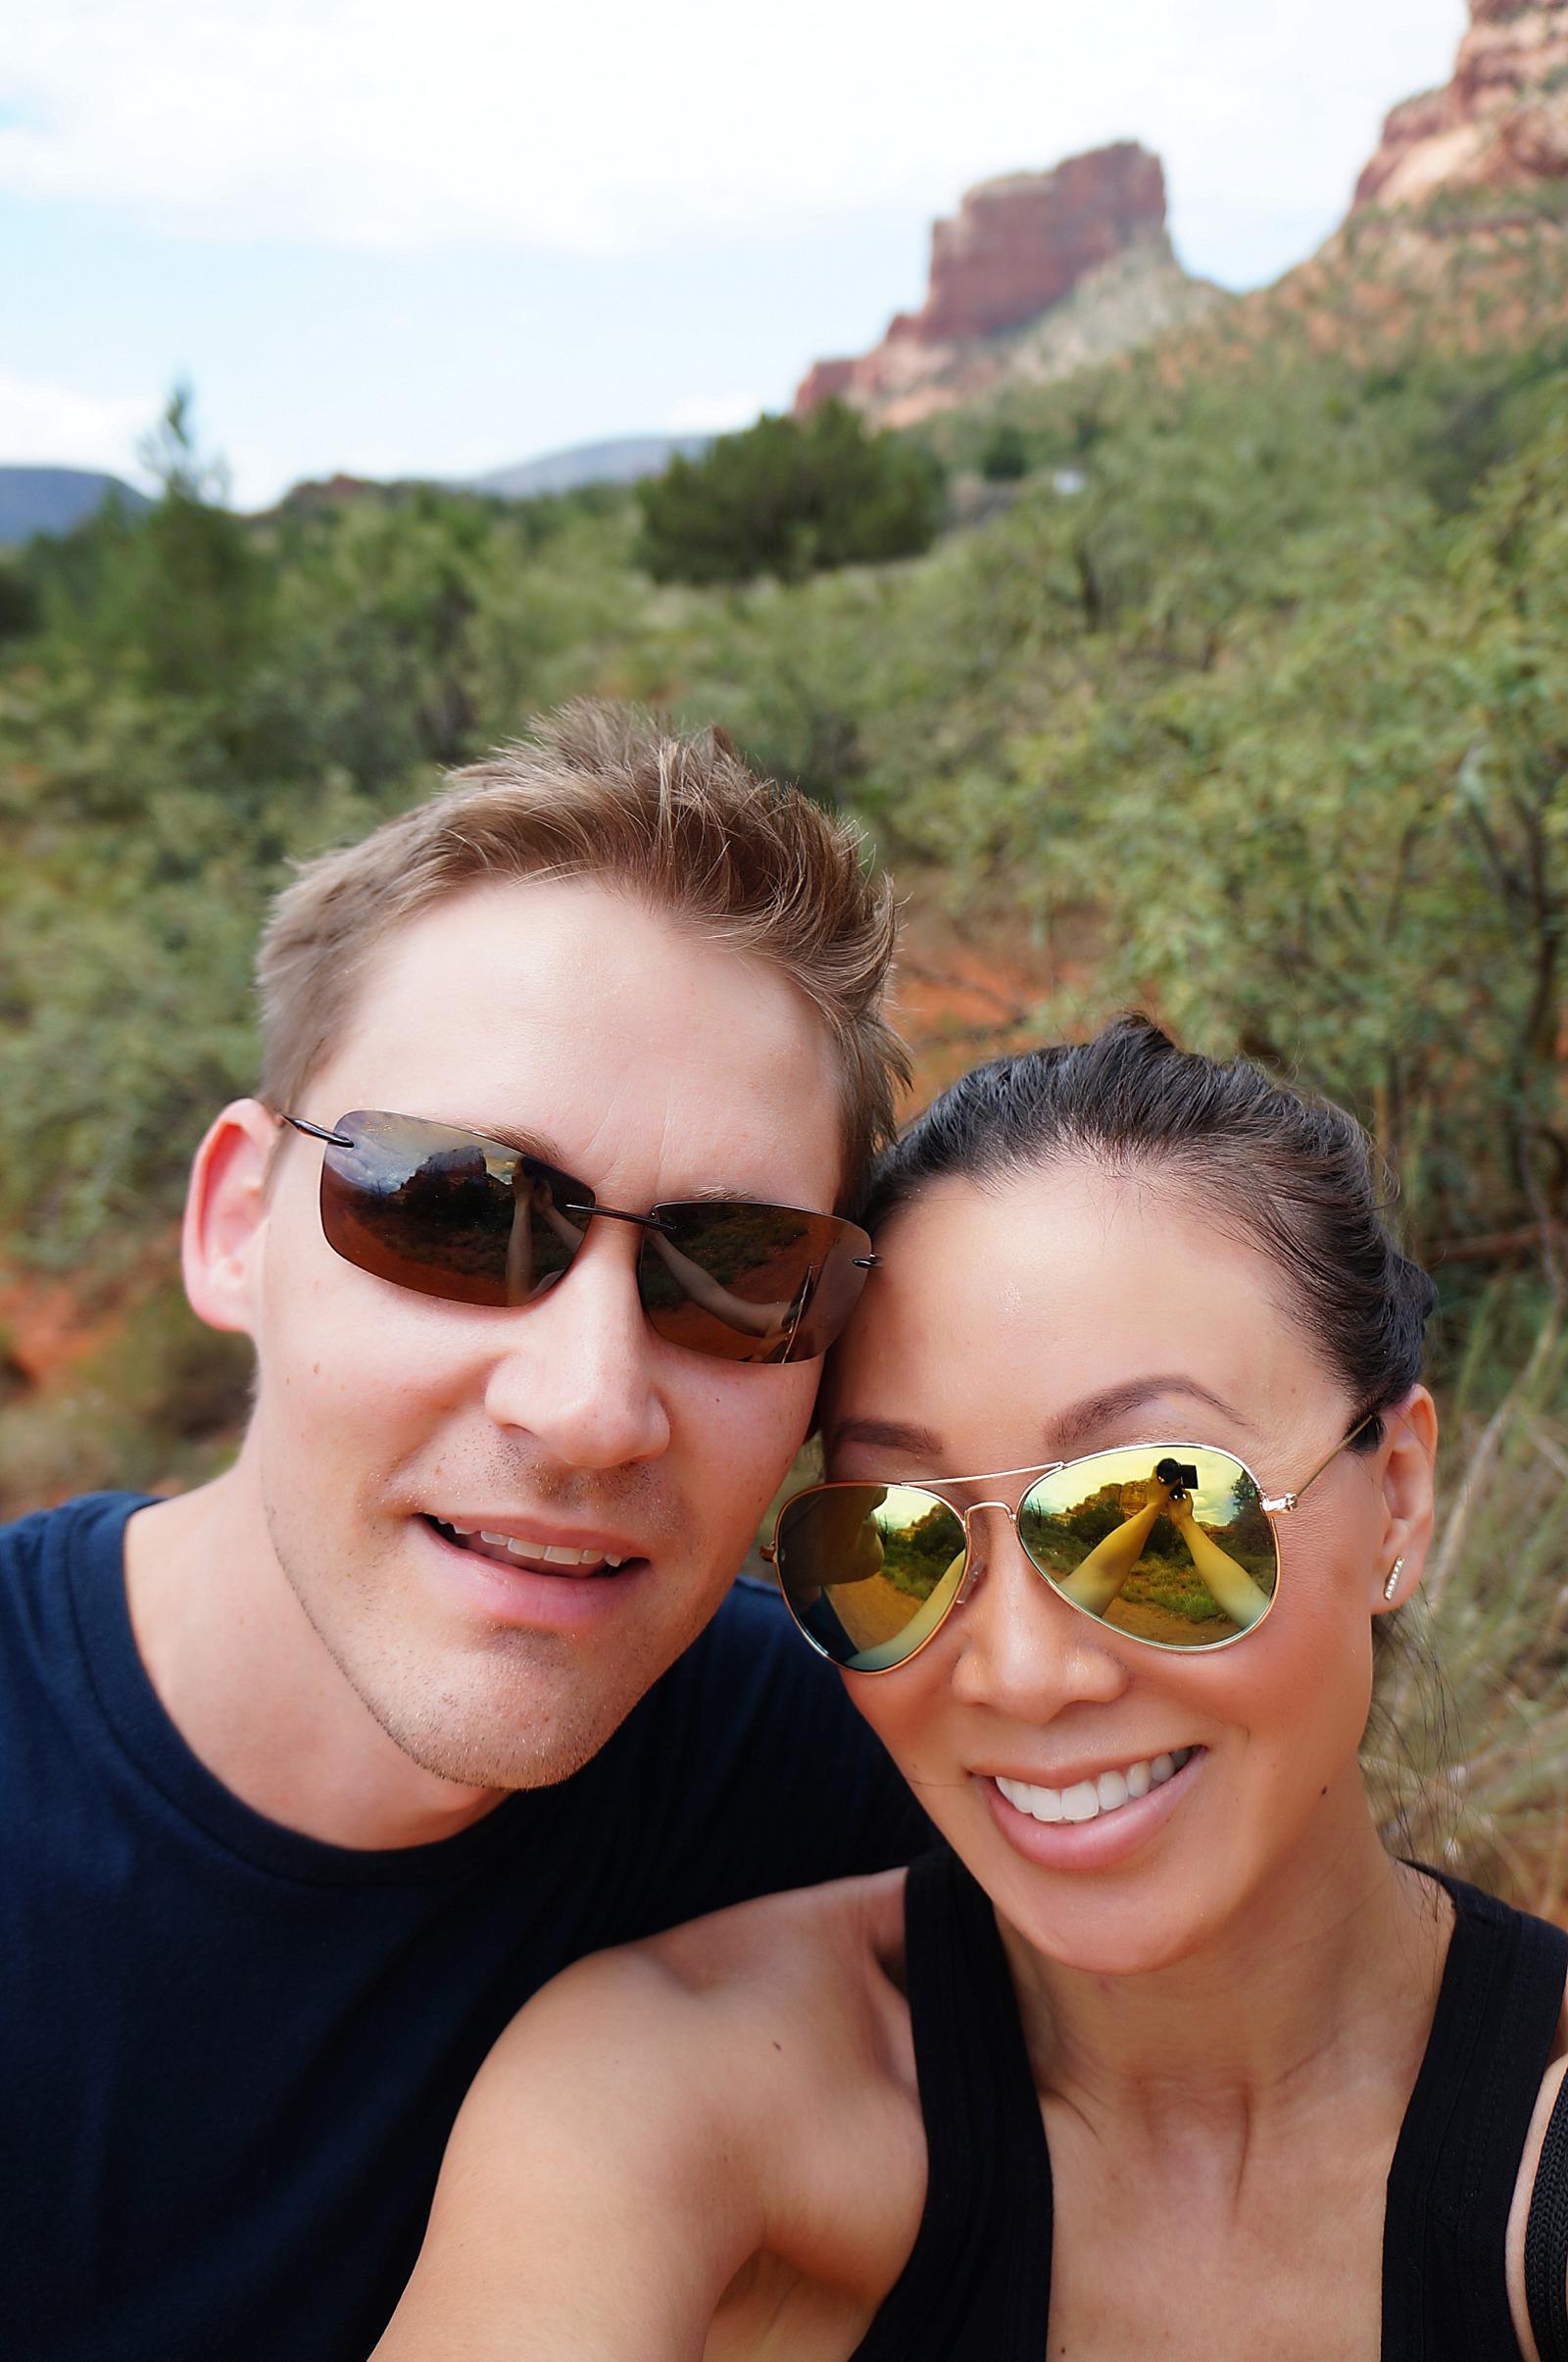 sedona-hilton-sedona-resort-bell-rock-travel-blogger-arizona-phoenix-review_0027